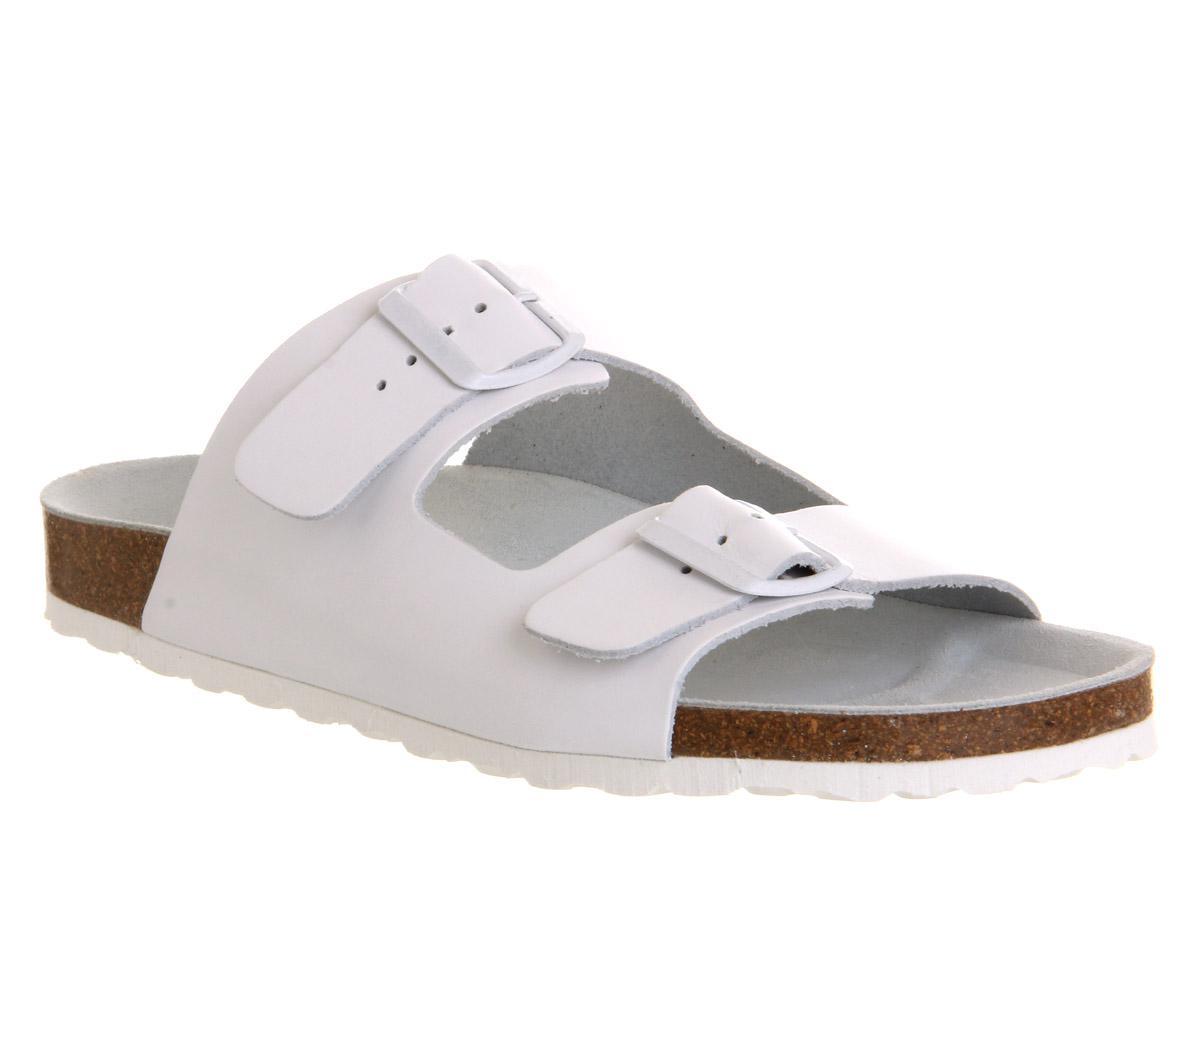 0582fe713dbc7b Office Marbella Buckle Sandal in White for Men - Lyst